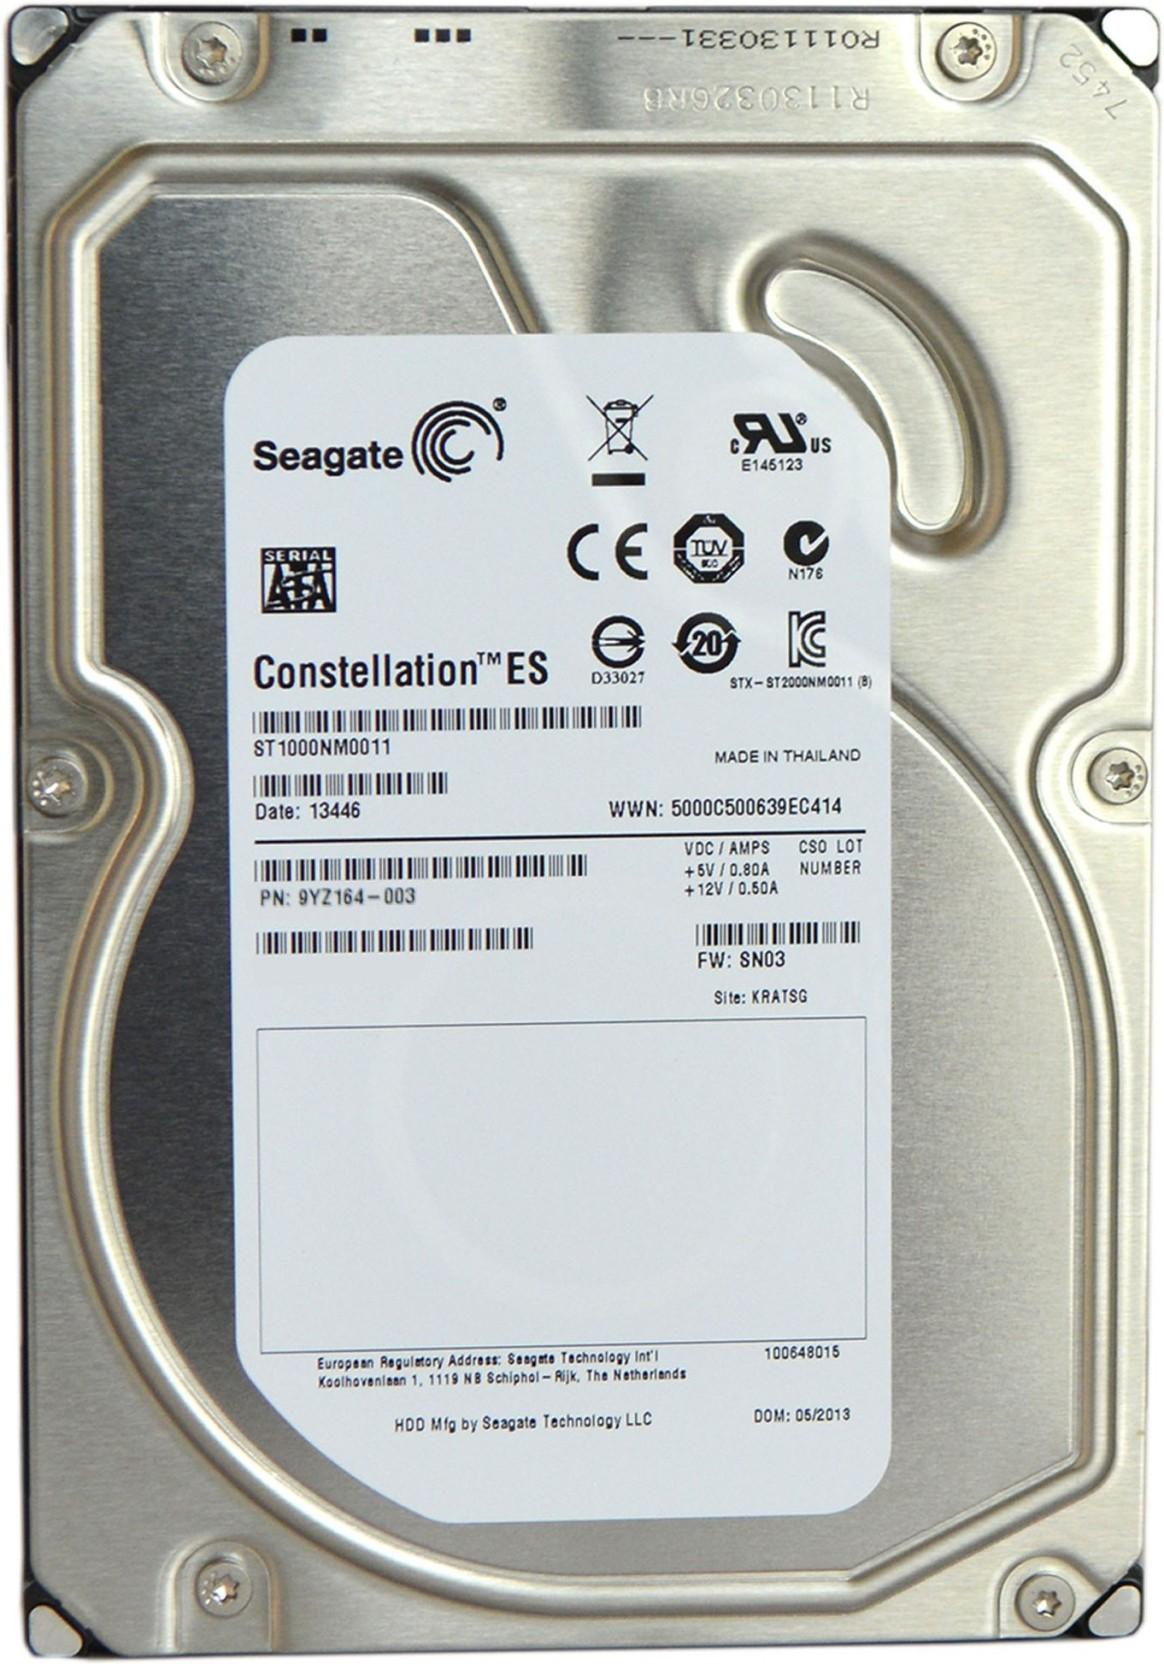 Seagate Constellation Es 1 Tb Servers Internal Hard Disk Drive Hdd Hardisk Pc 35 1tb 1000gb St1000nm001 Share